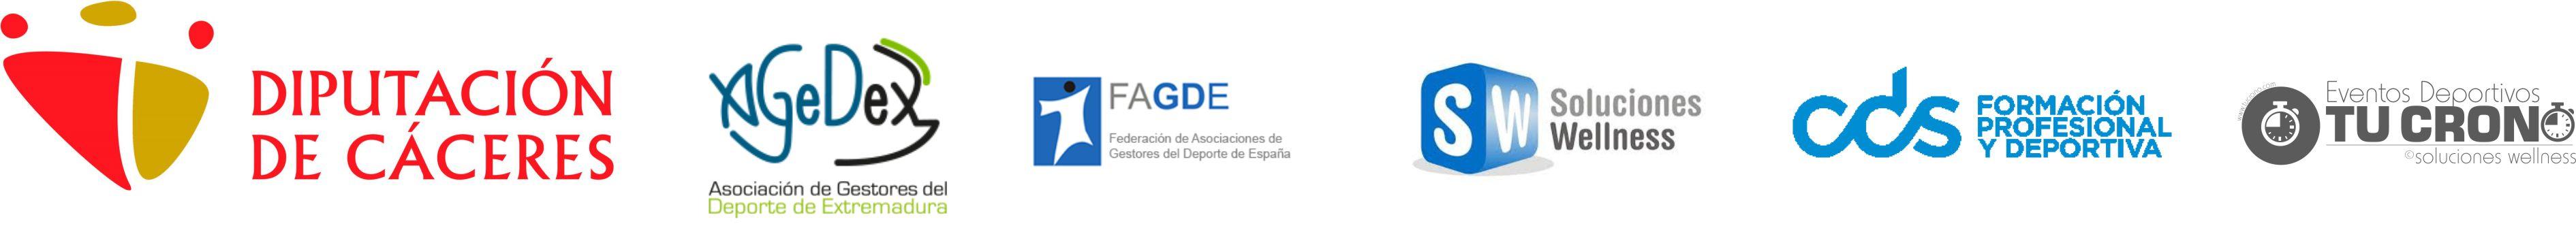 Logos_Jornada-Eventos_DipCC